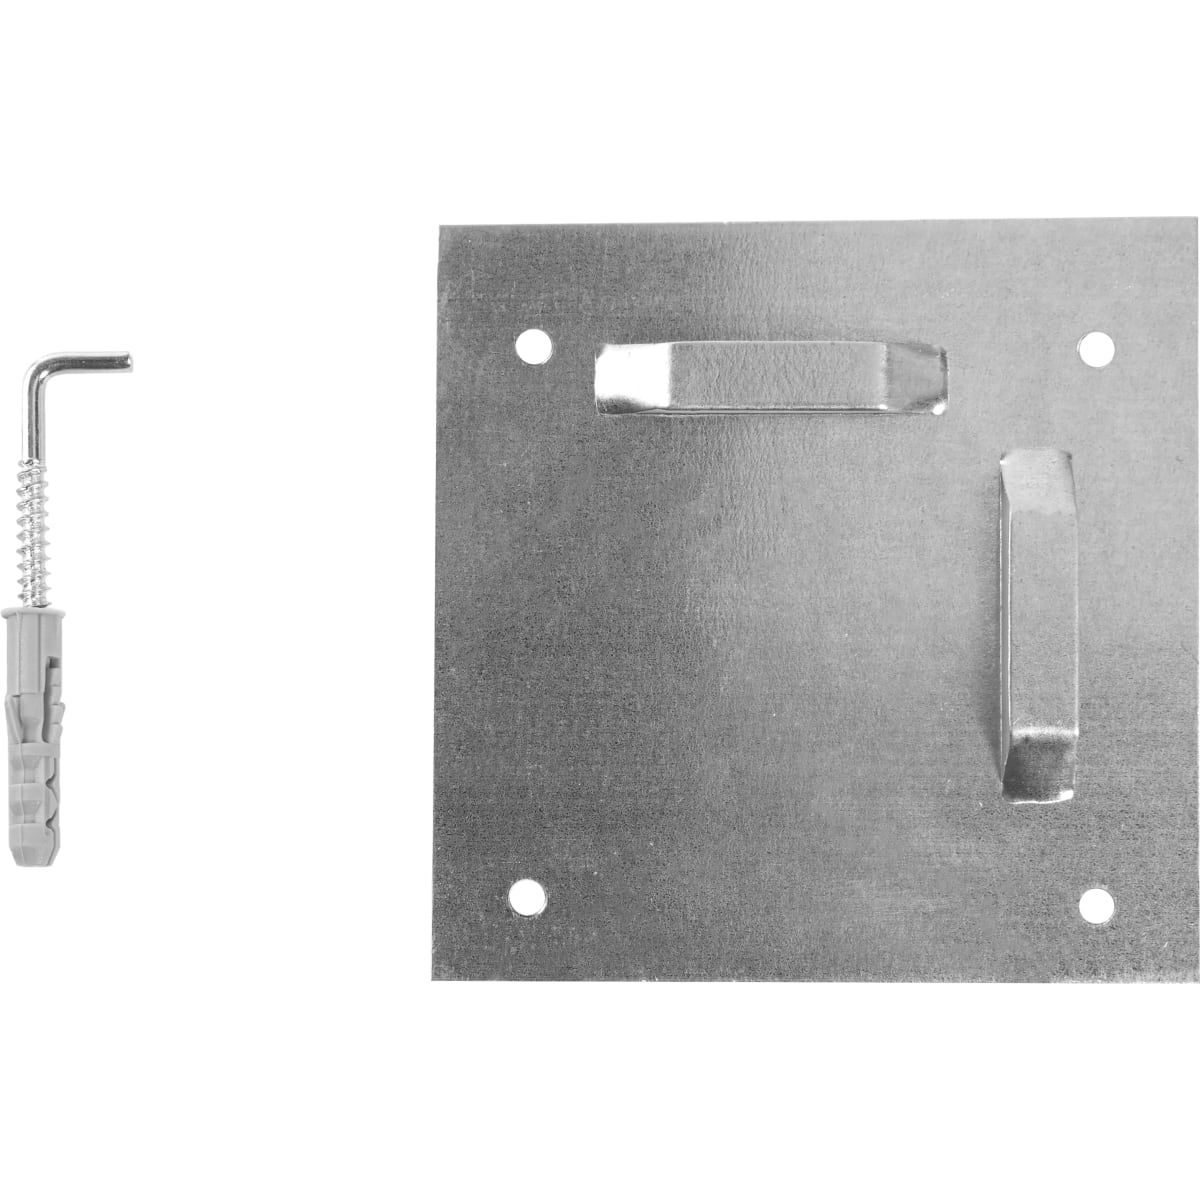 Набор крепления для зеркала Sensea пластина 9x9 см